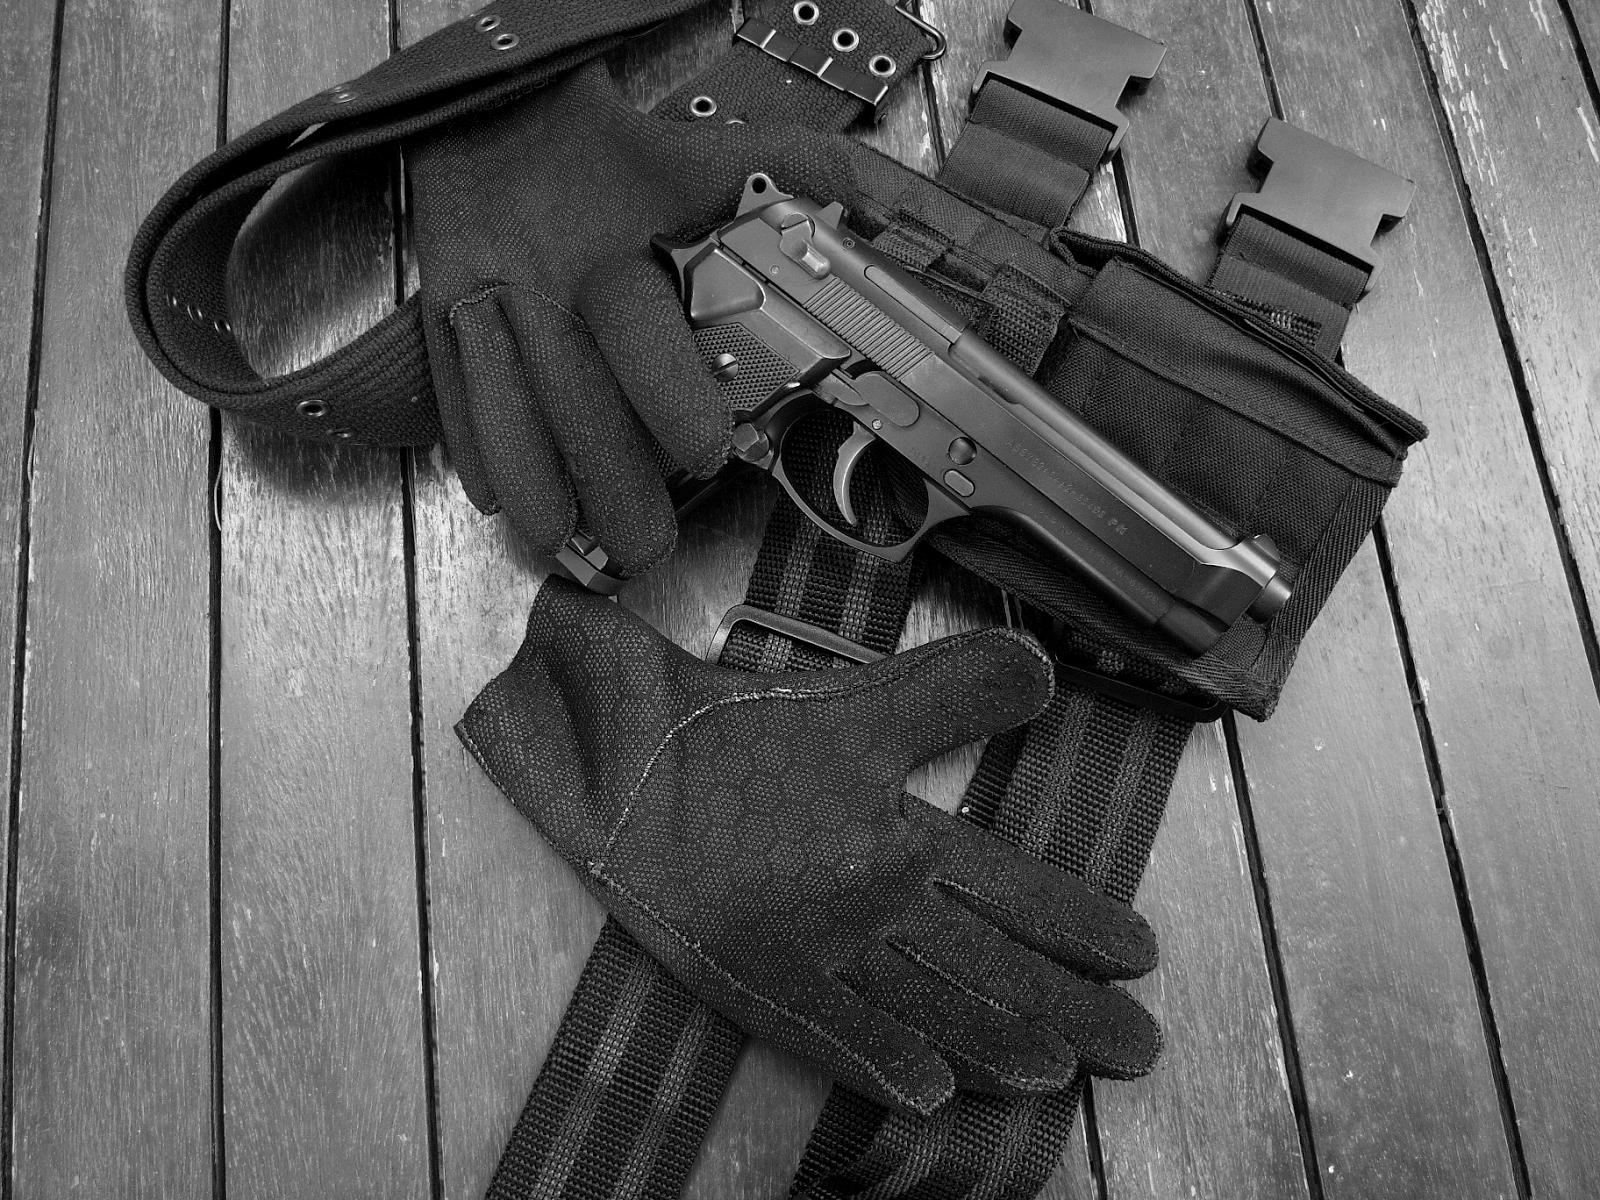 military neoprene gloves by gravity zero